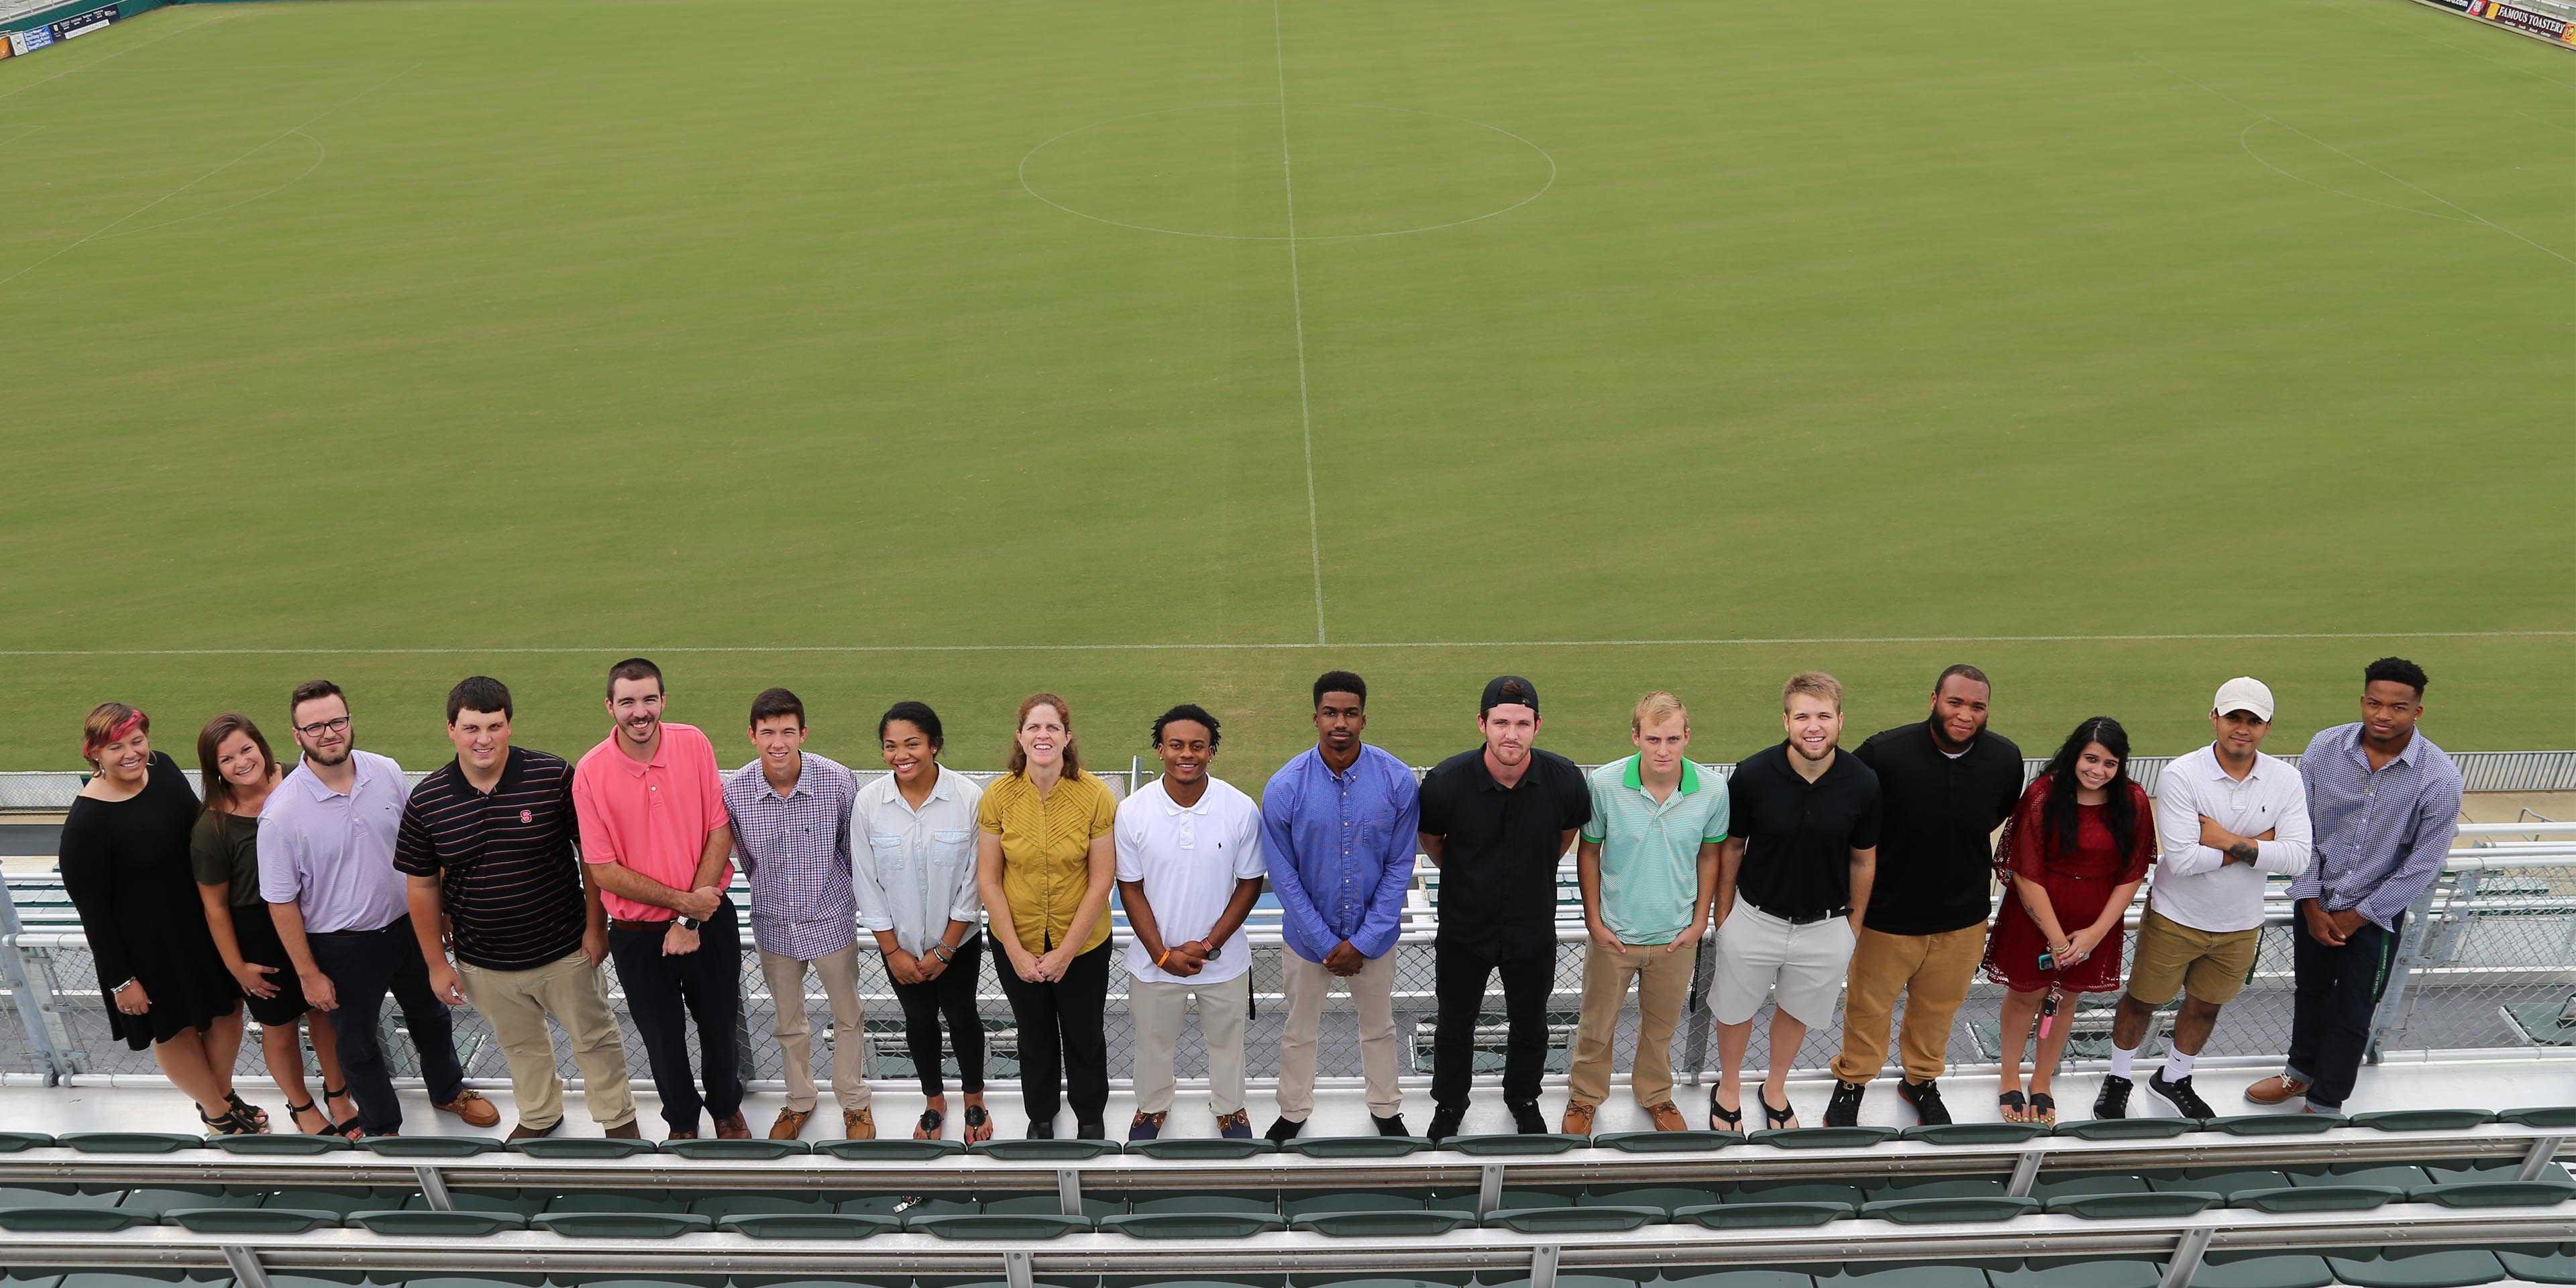 WPU Students at the NC Football Club stadium.